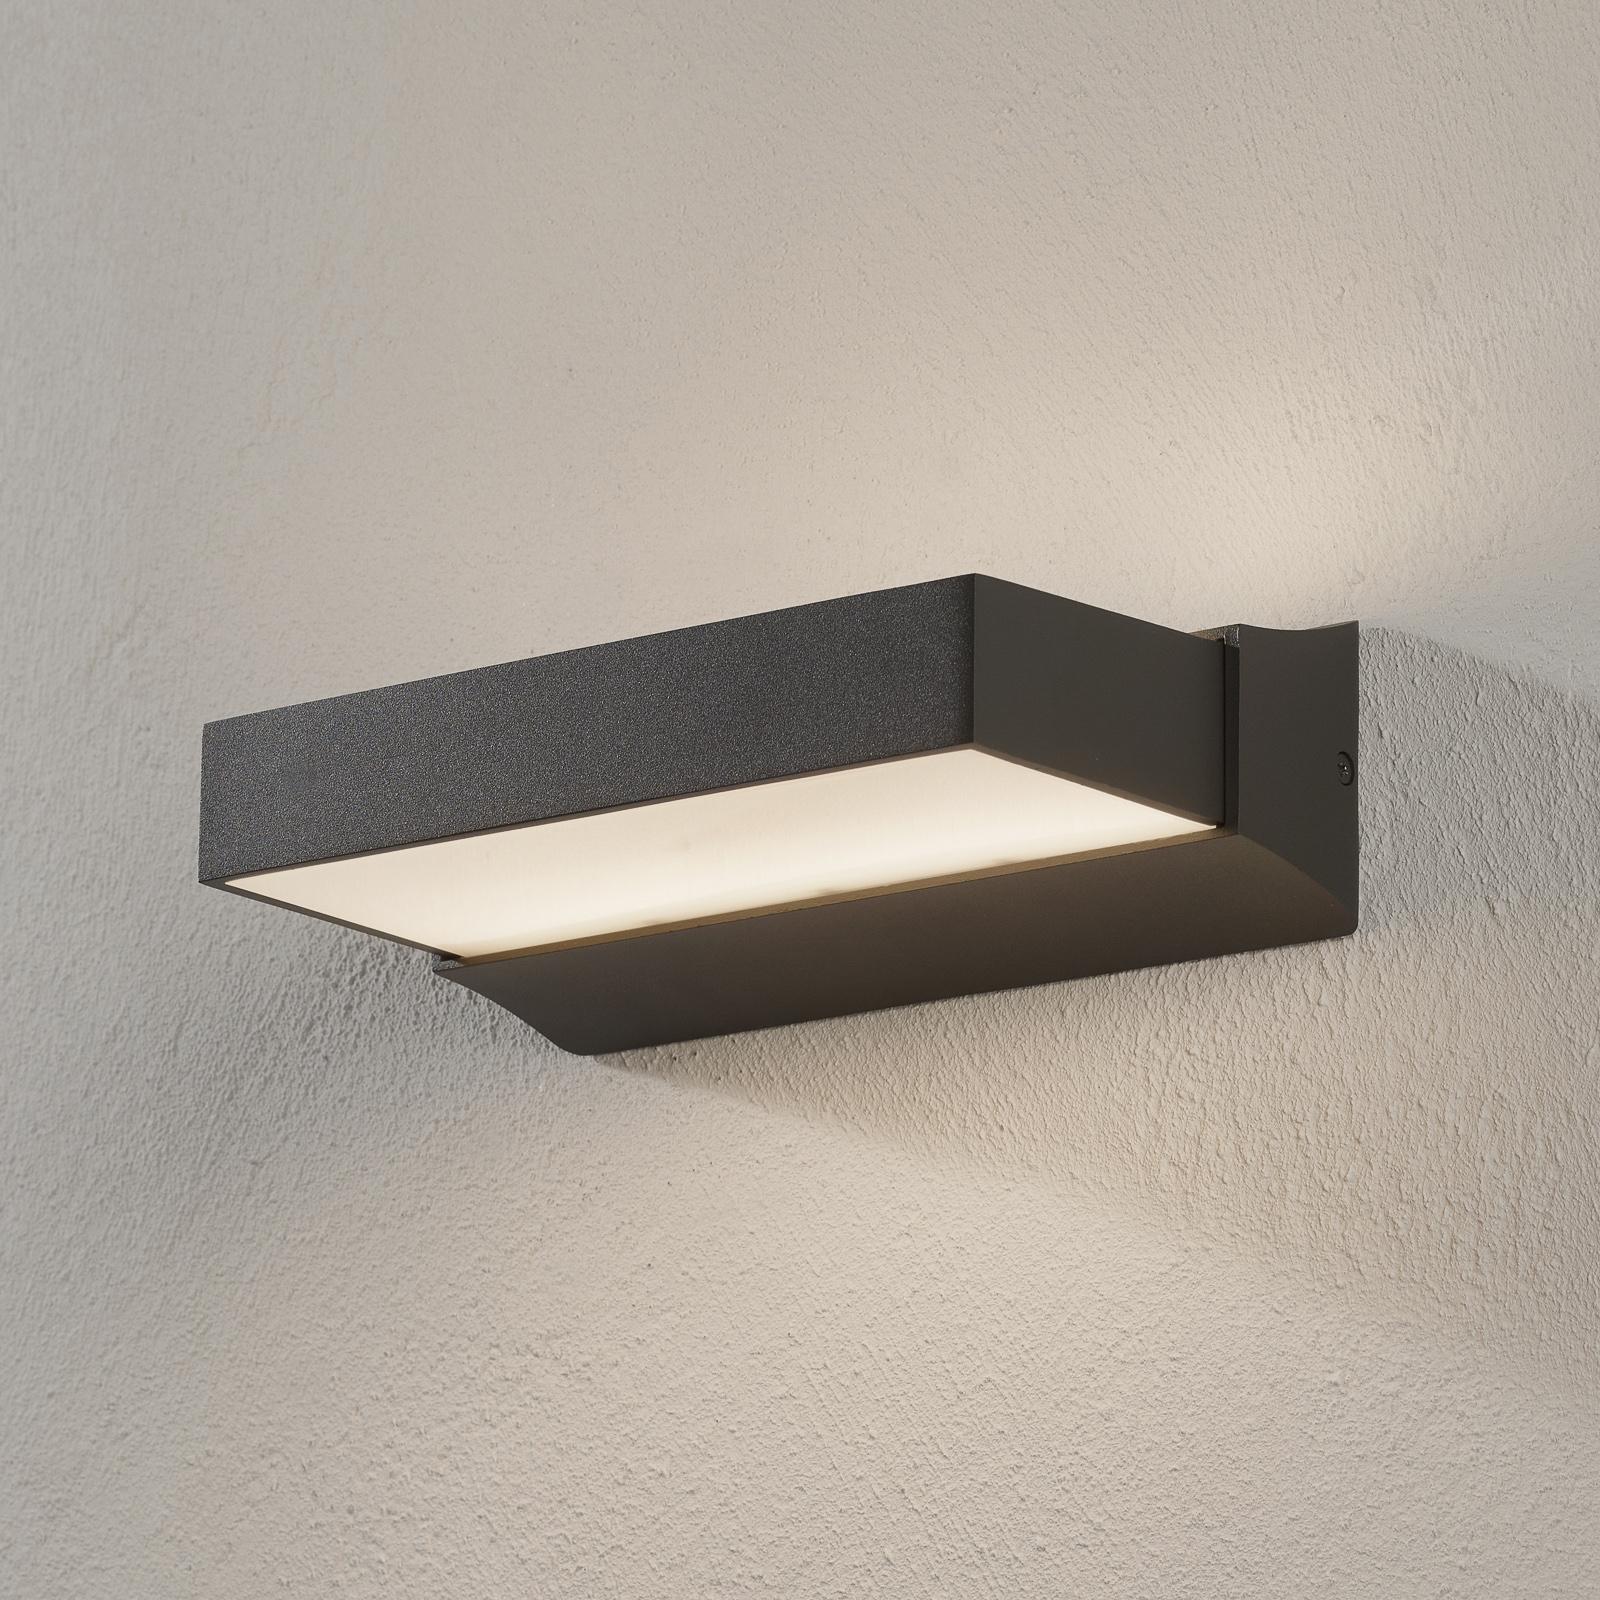 LED-ulkoseinälamppu Cuando, up/down